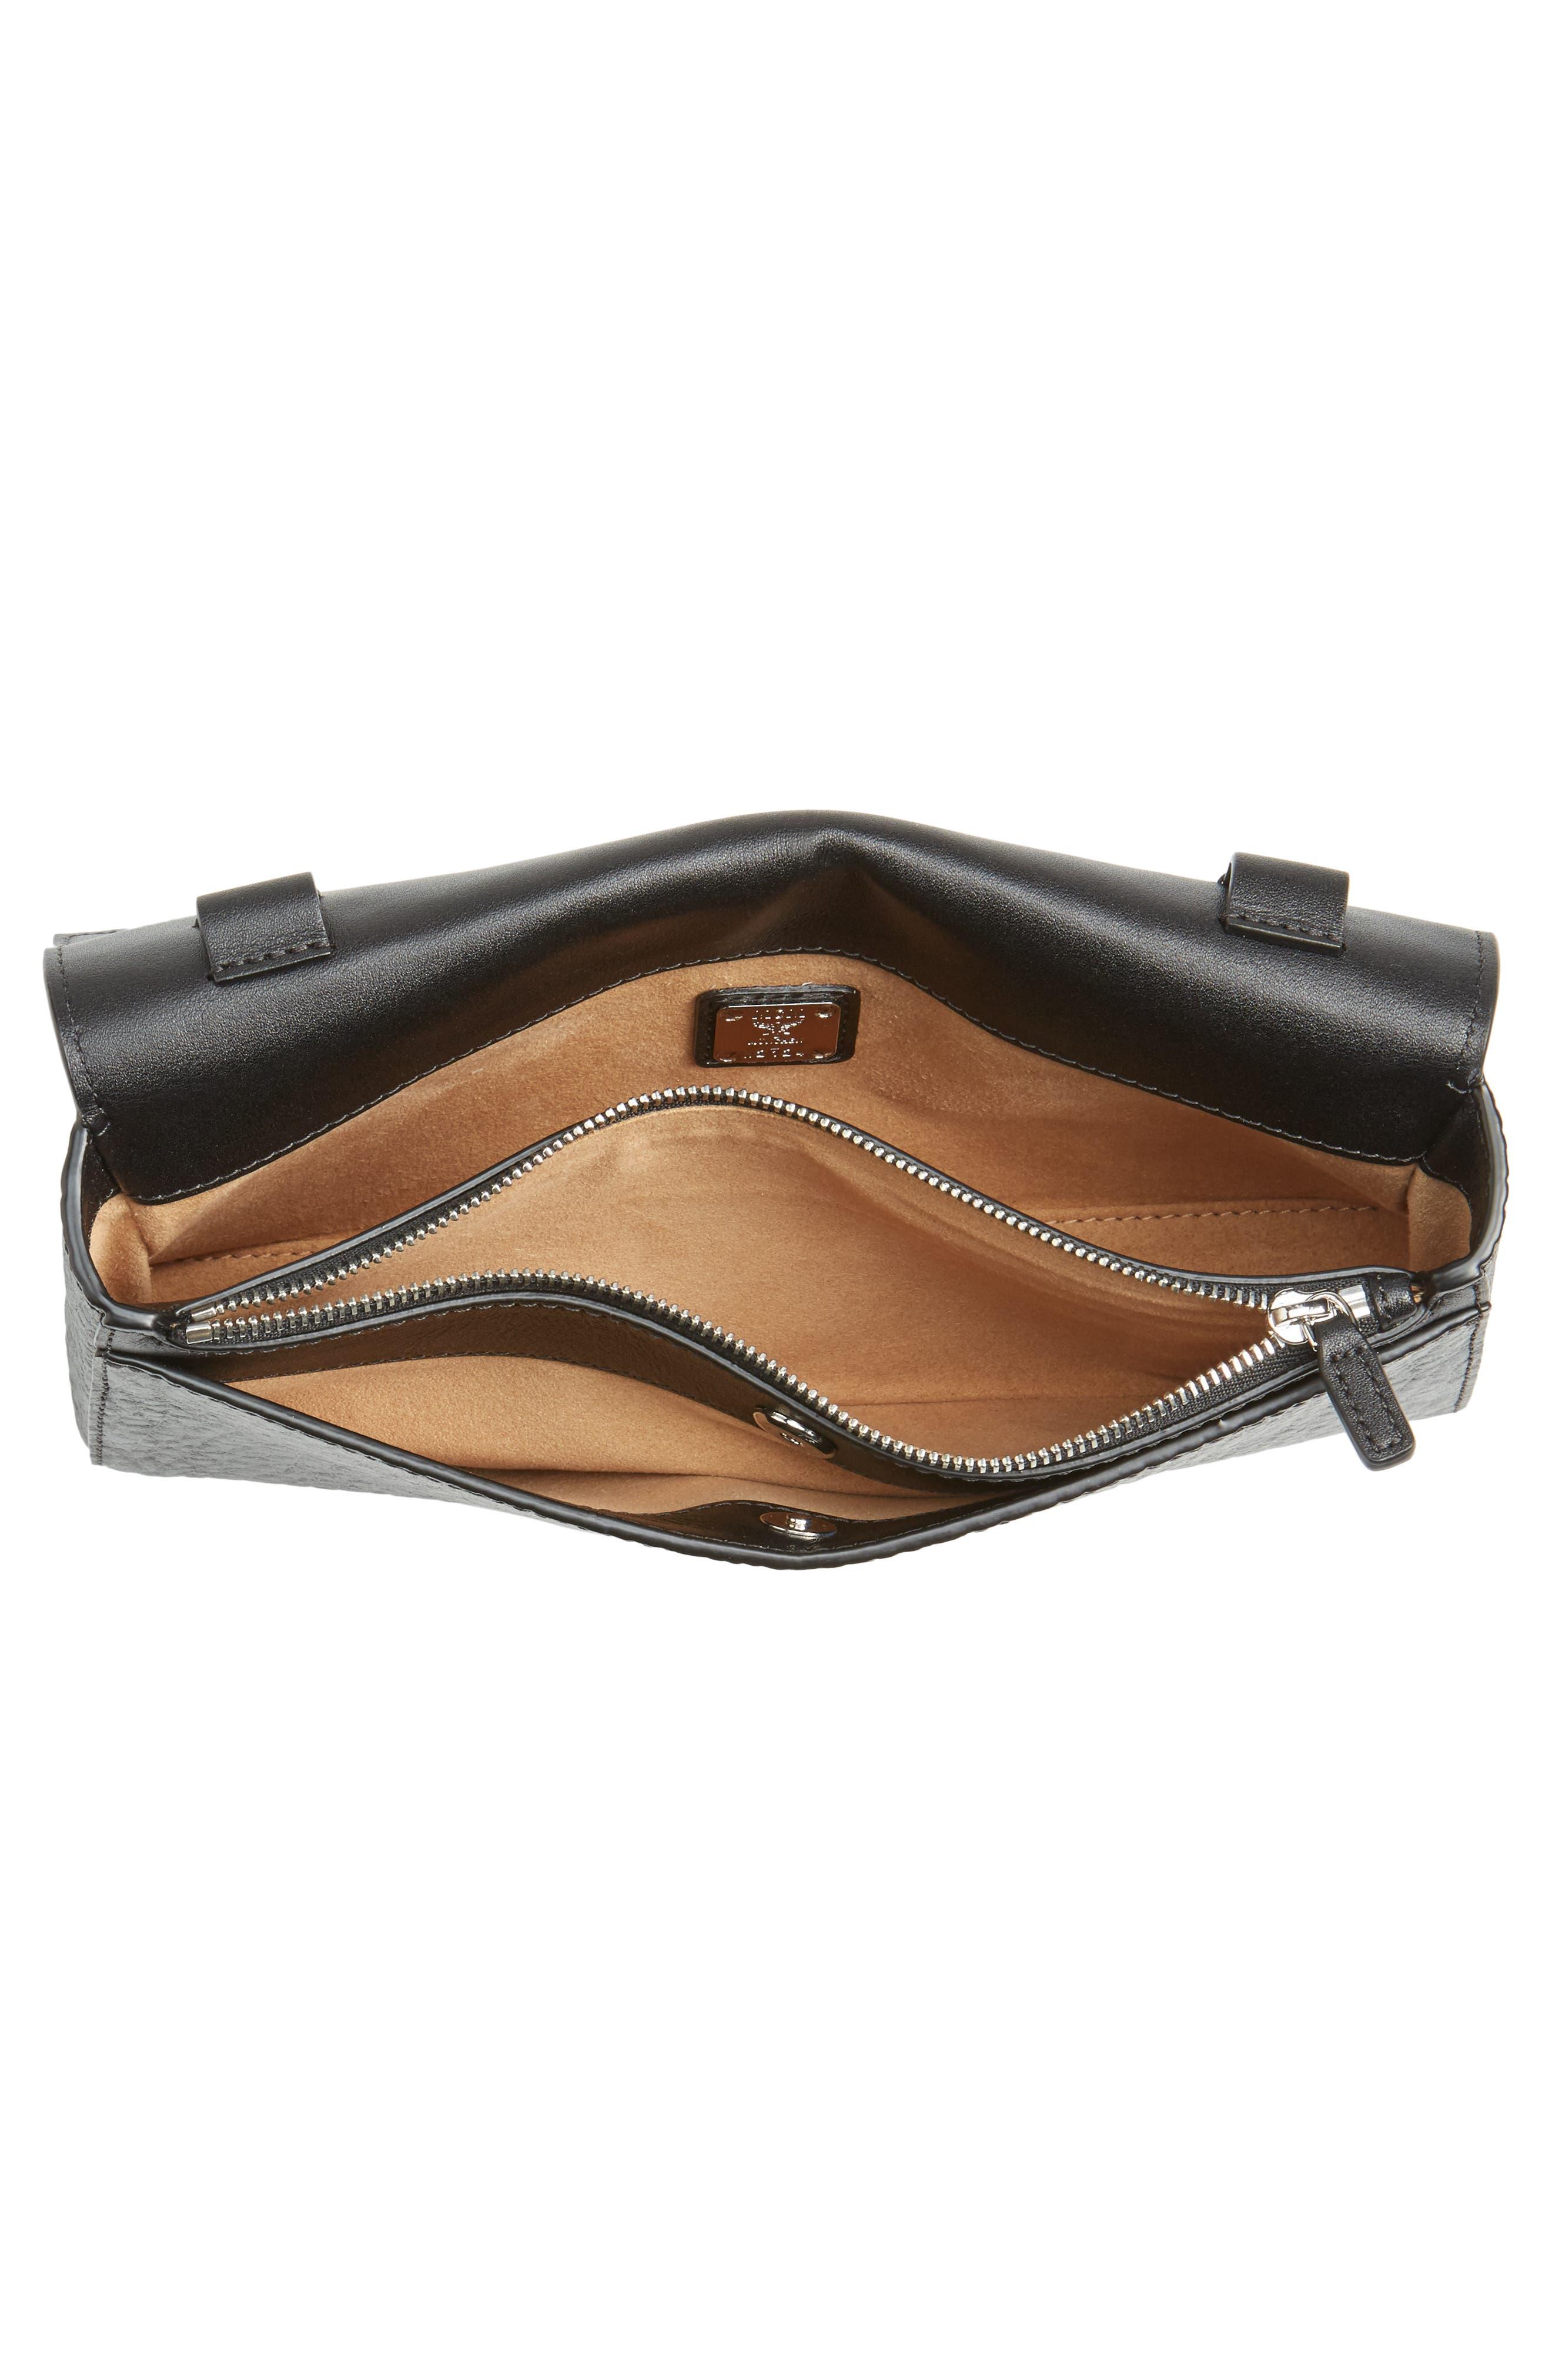 Millie Monogrammed Leather Crossbody Bag,                             Alternate thumbnail 4, color,                             001